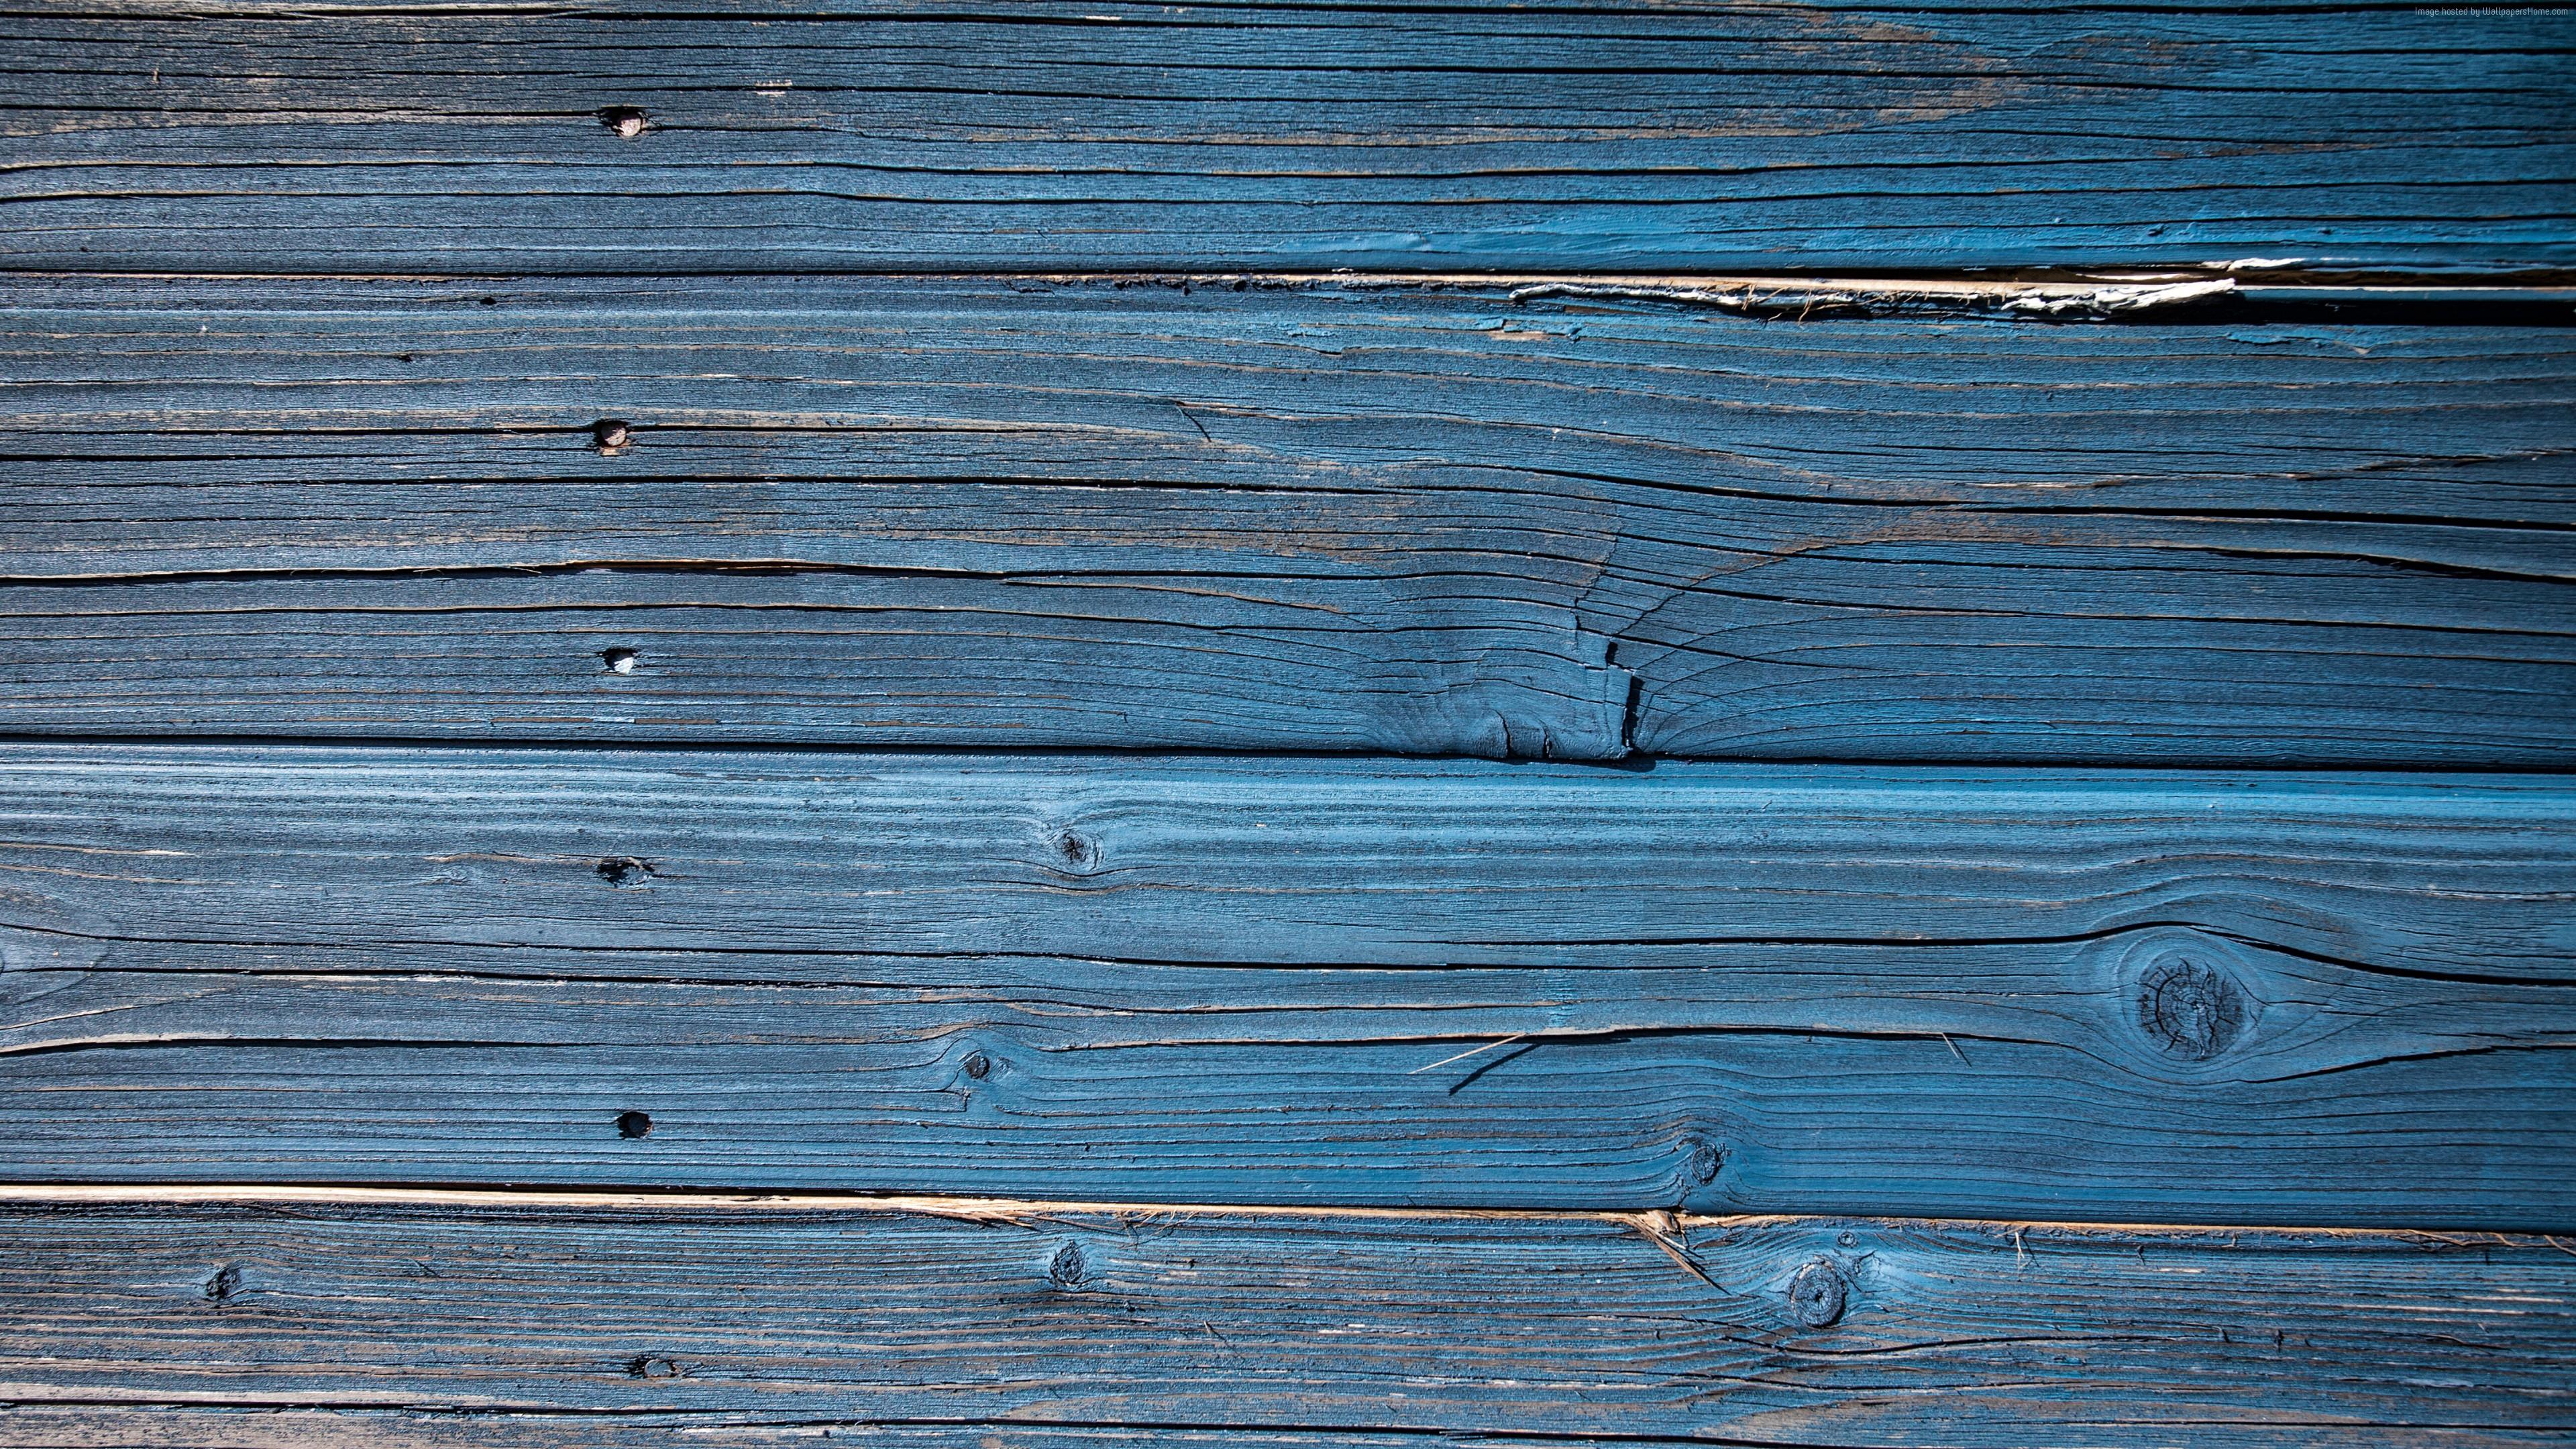 wood texture 4k 1539370705 - Wood Texture 4k - wood wallpapers, texture wallpapers, abstract wallpapers, 4k-wallpapers